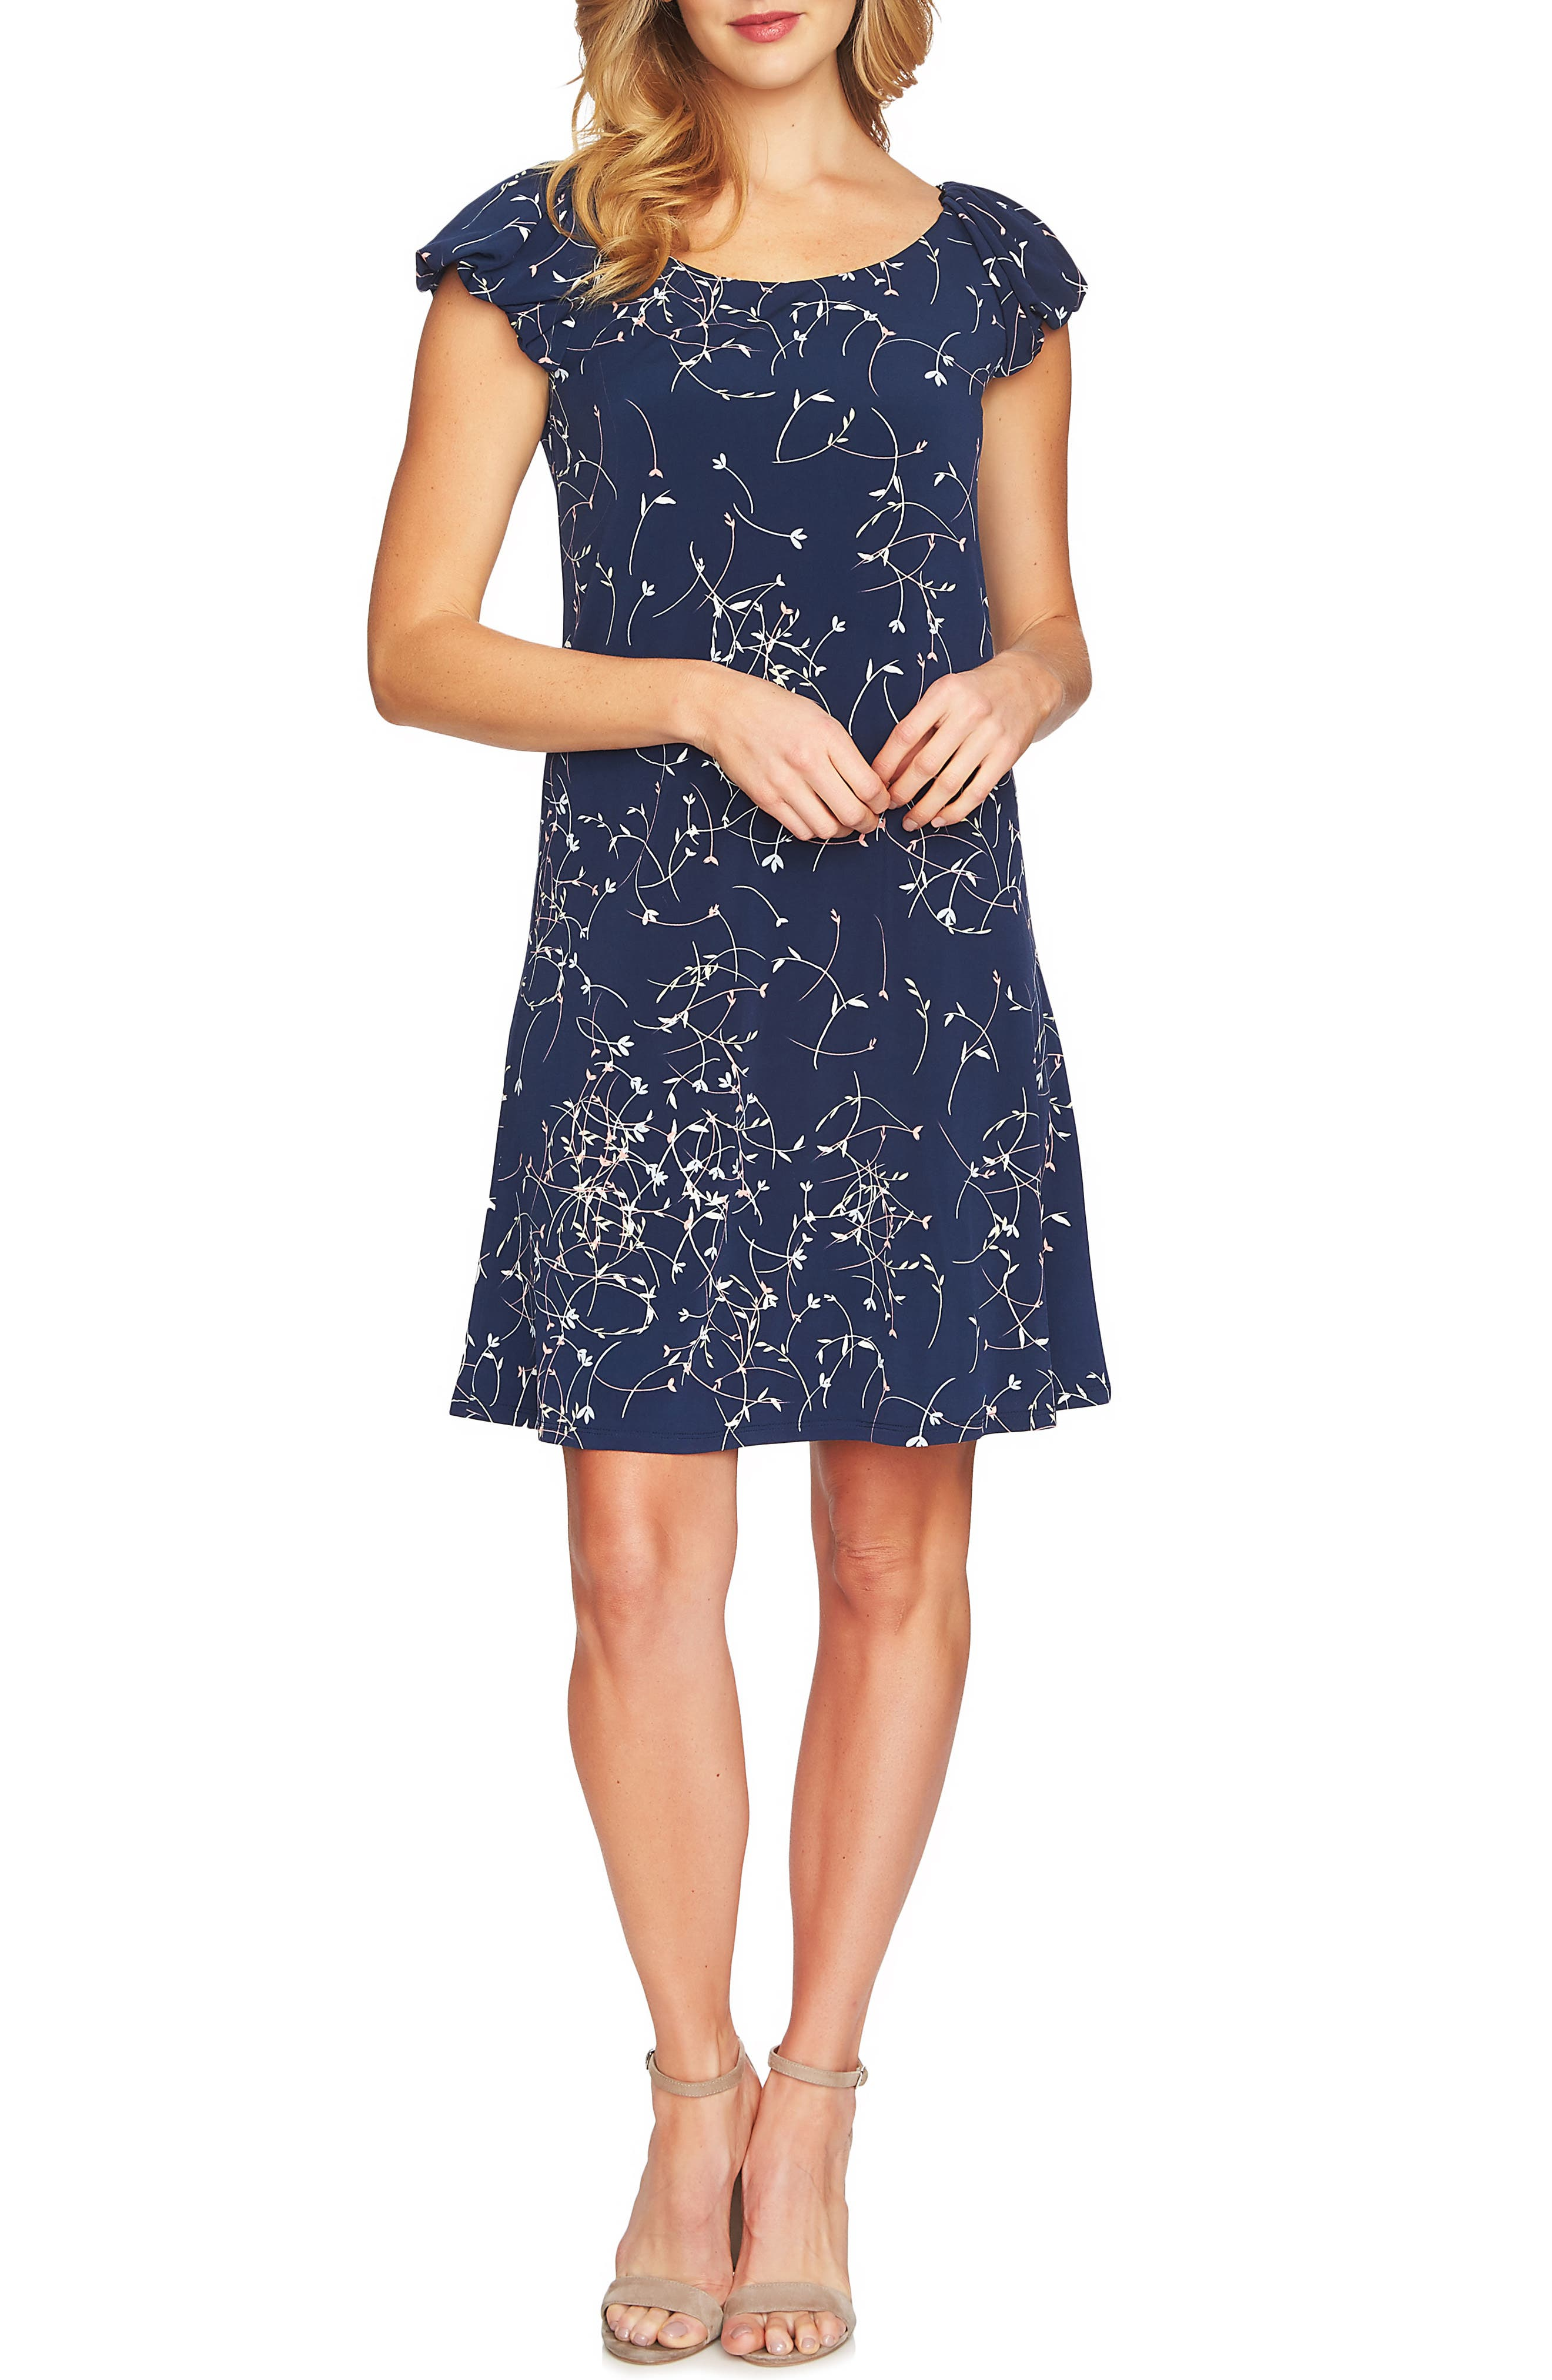 Ditsy Swirls Puffed Sleeve Dress,                             Alternate thumbnail 8, color,                             429